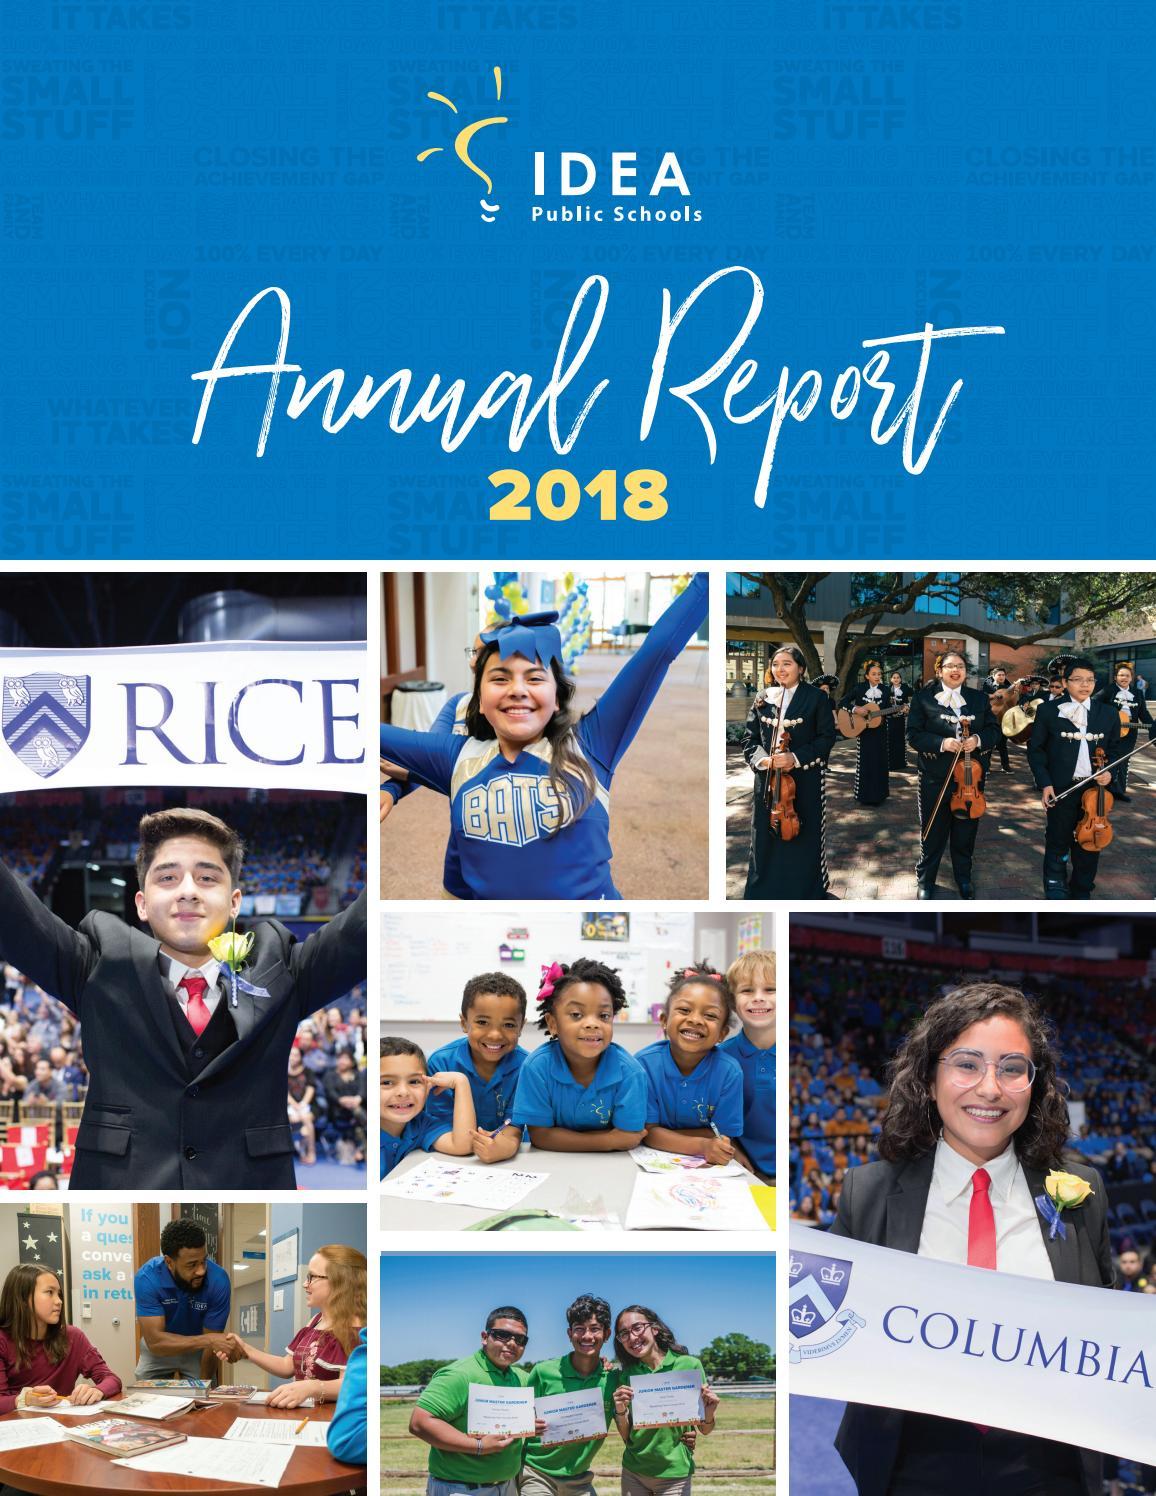 Idea Public Schools Annual Report 2018 By Idea Public Schools Issuu